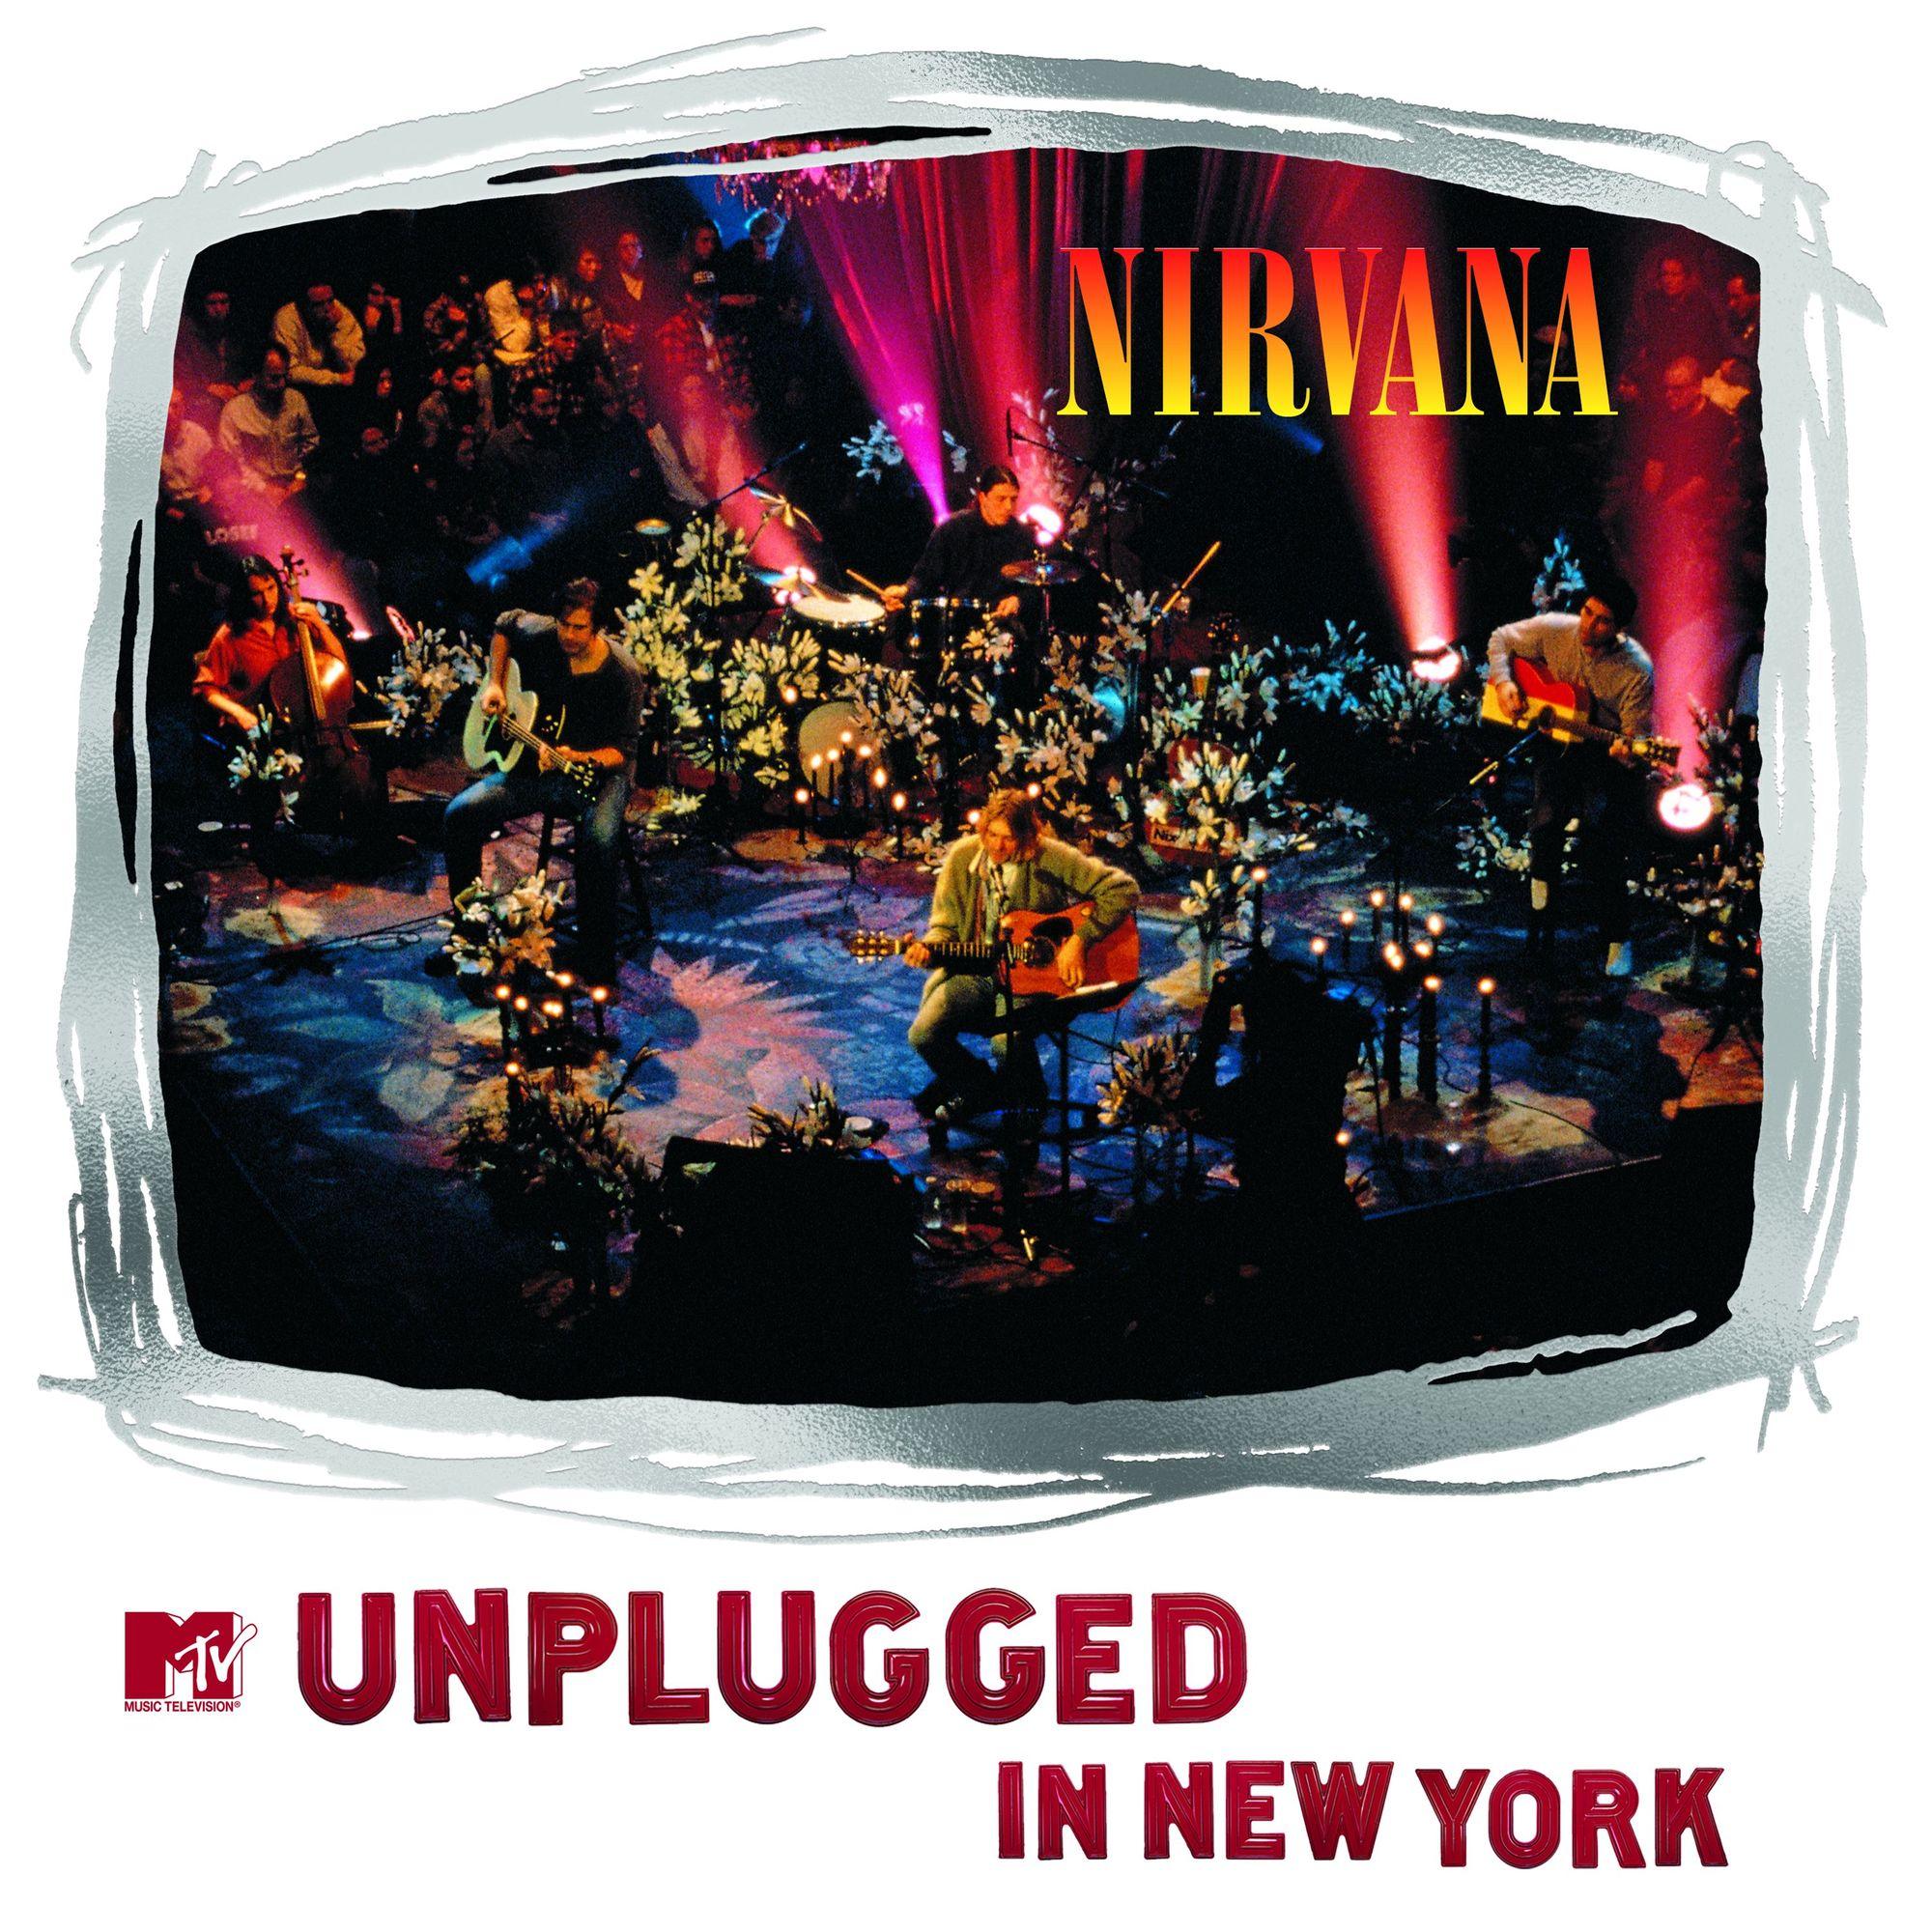 bol.com | MTV Unplugged In New York (CD), Nirvana | CD ...